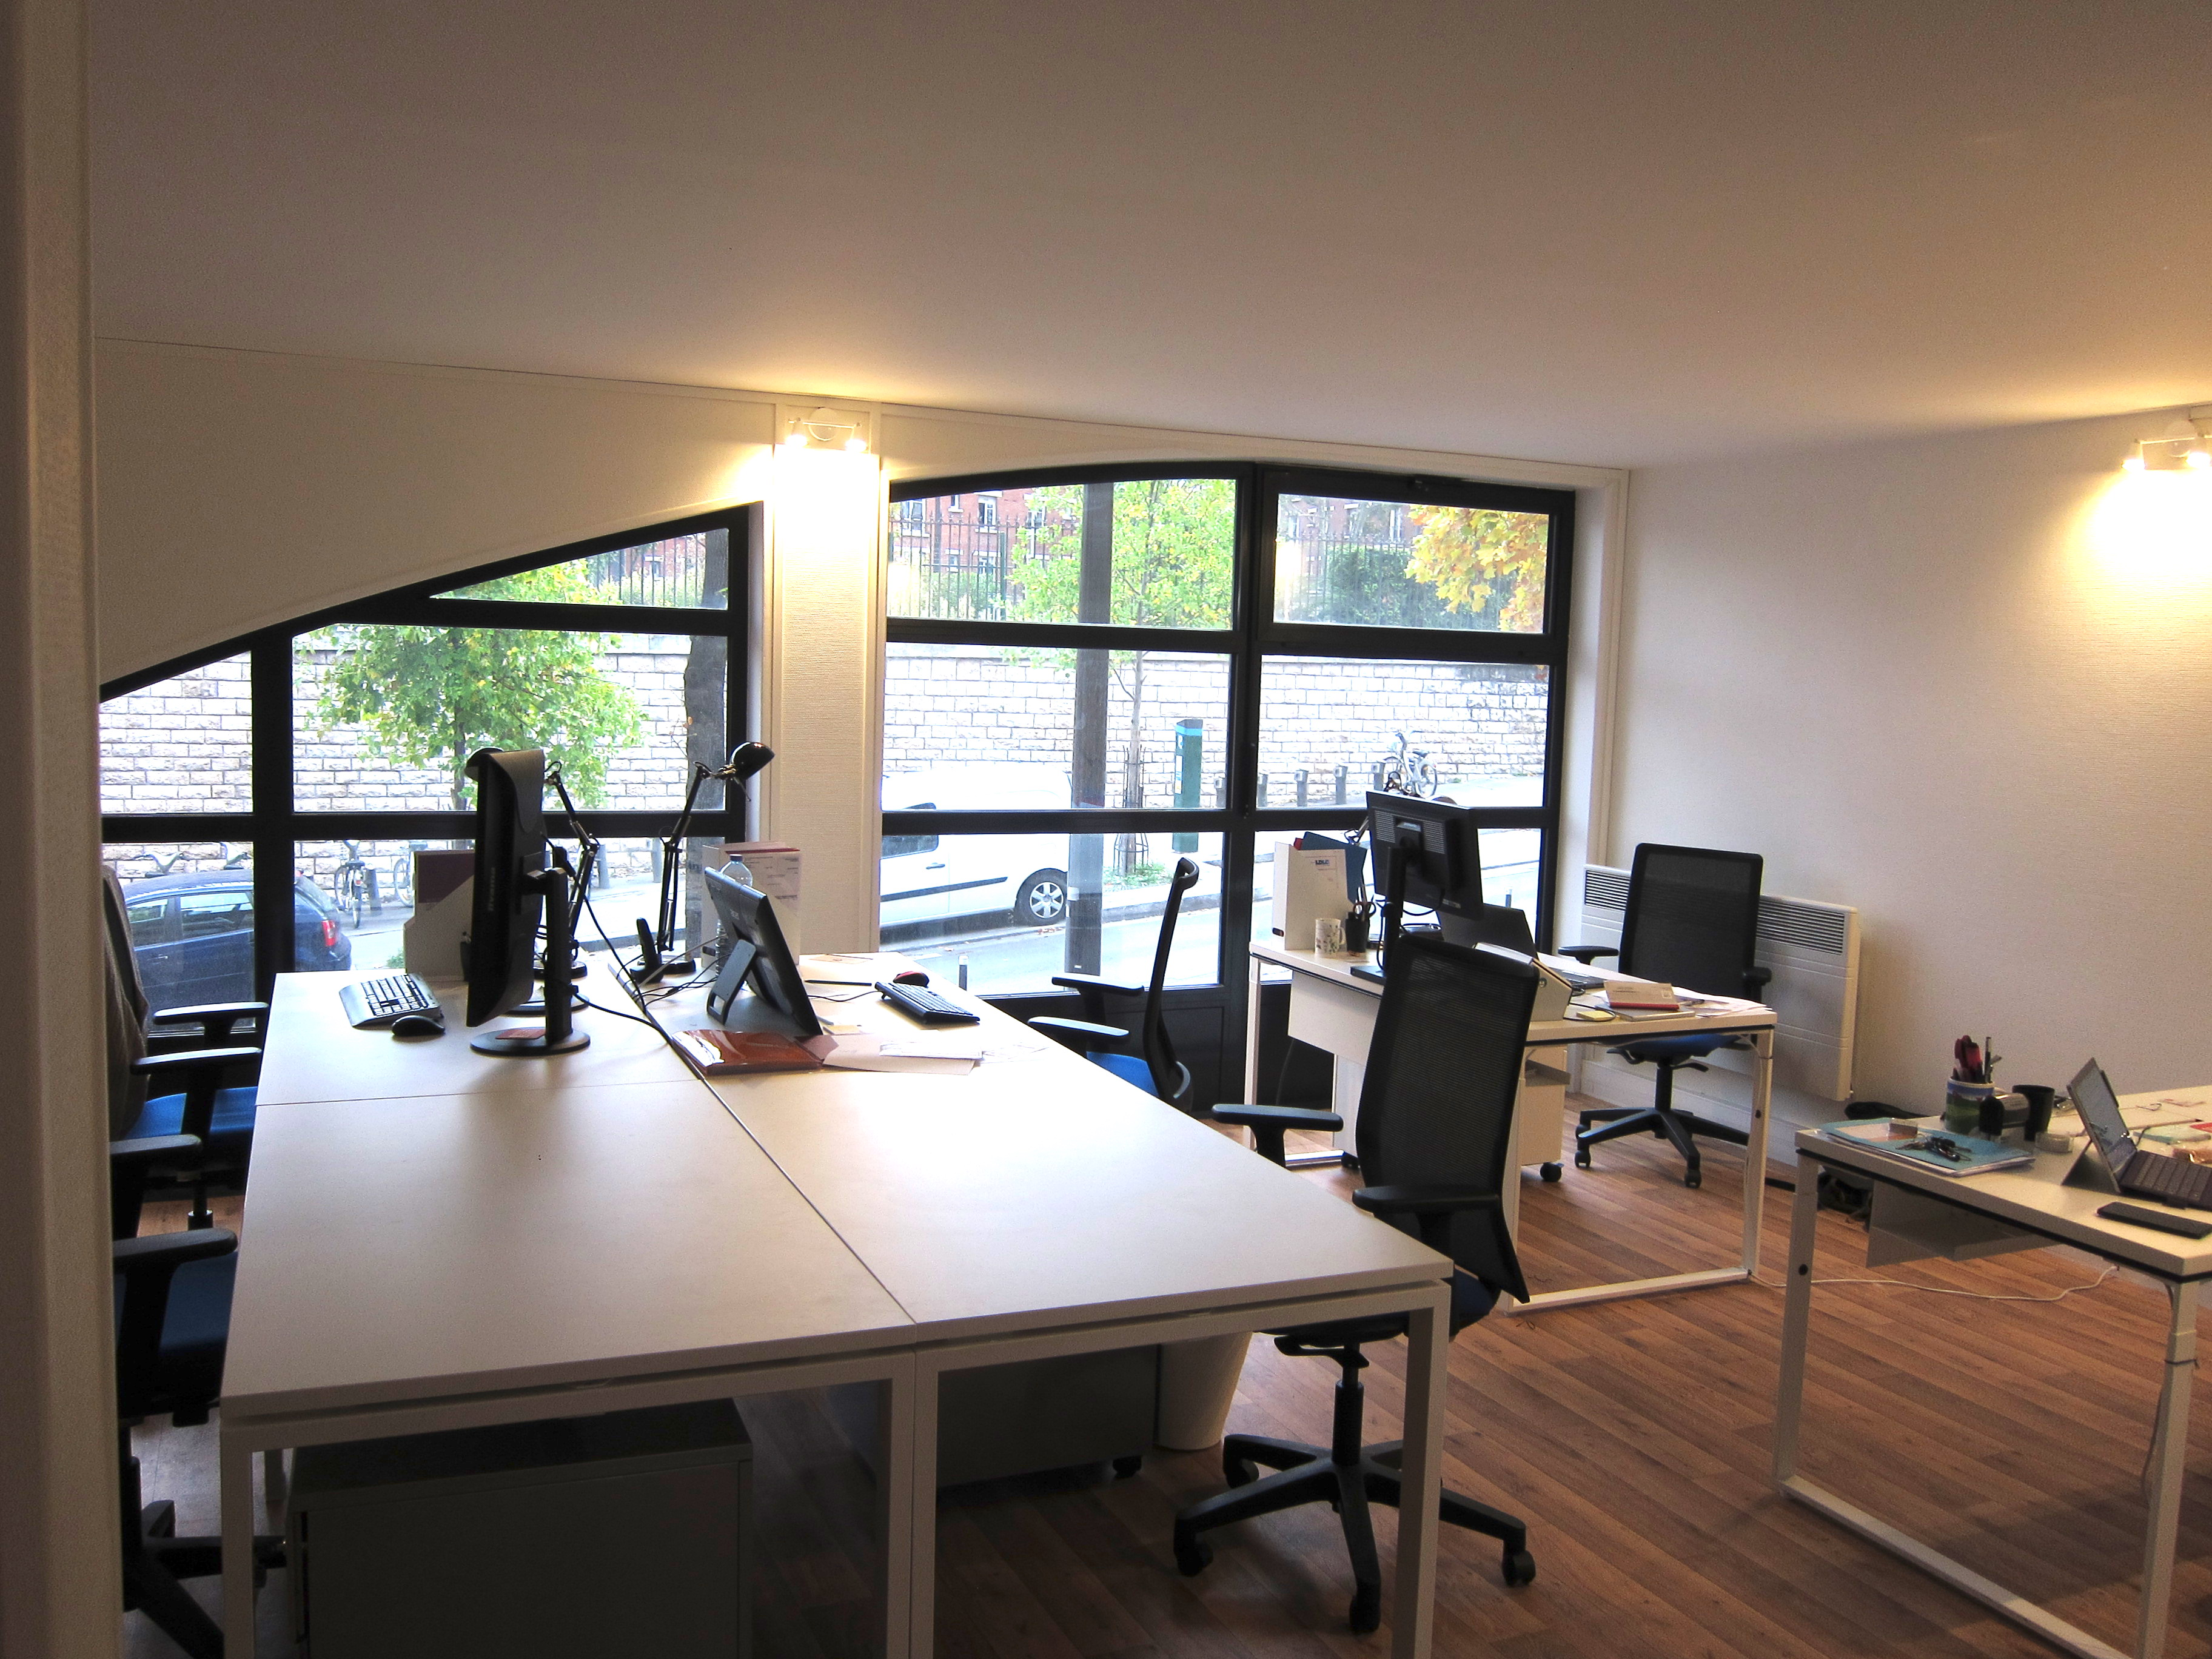 img 0042 adopte un bureau. Black Bedroom Furniture Sets. Home Design Ideas